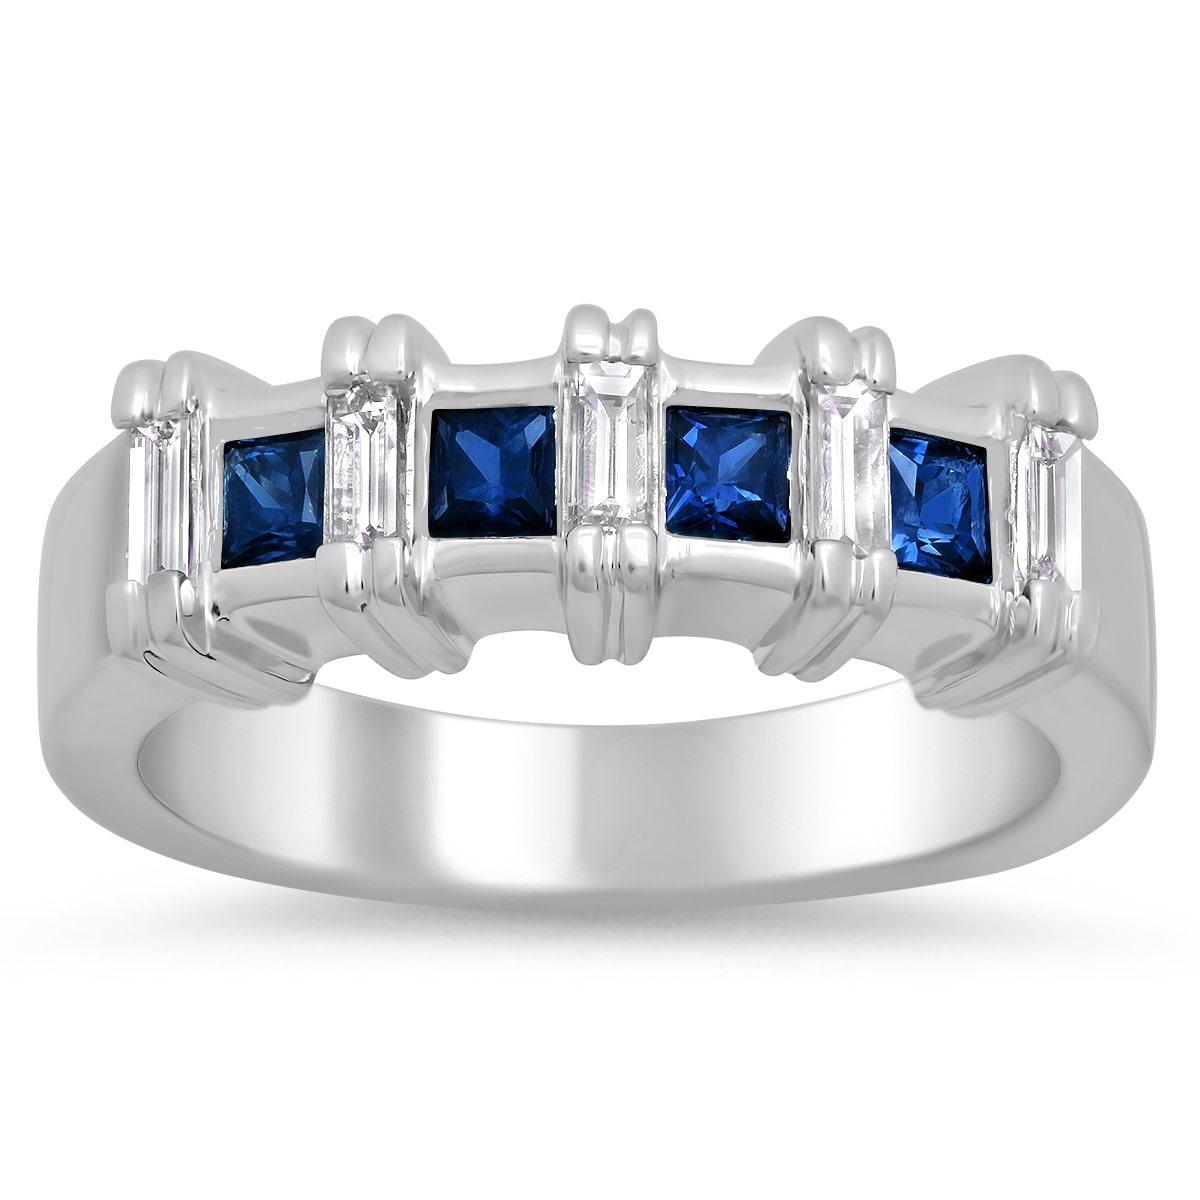 Chantal J 14k White Gold Sapphire and 1/3ct TDW Diamond Ring (F-G, VS1-VS2)